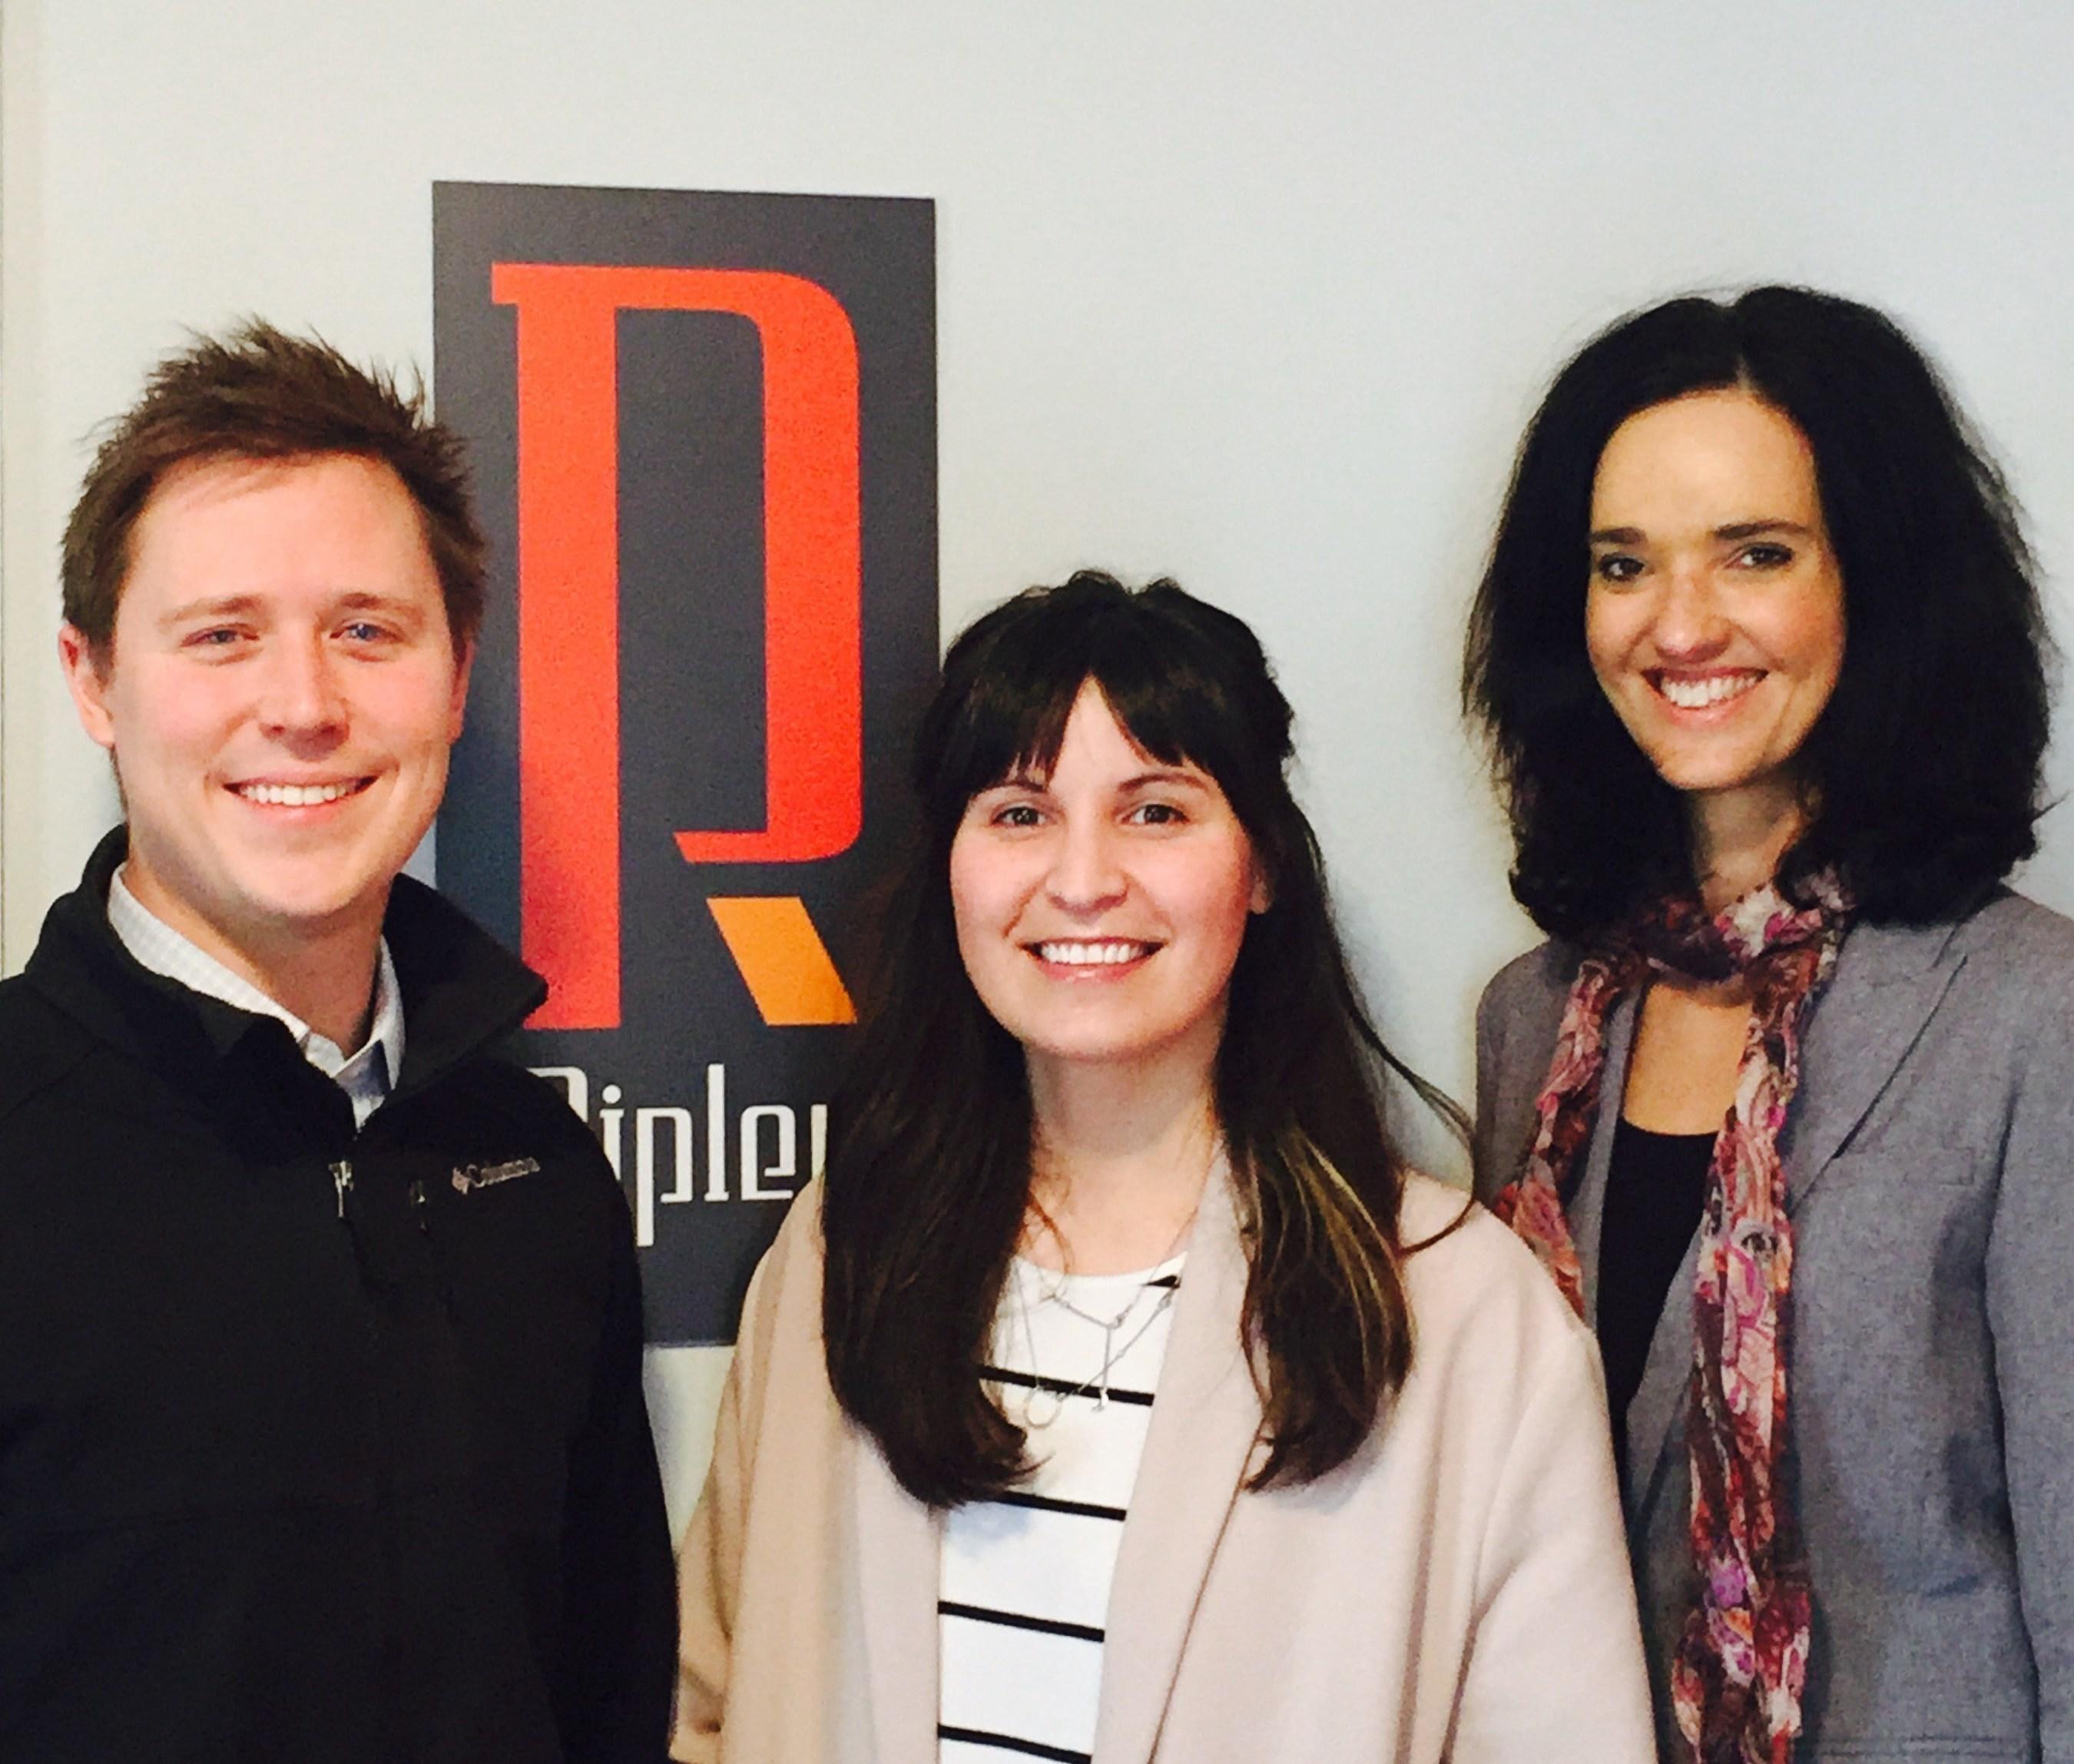 Ripley PR's three new team members: J.D. Sizemore, Abbigail Christensen and Celeste Vlok